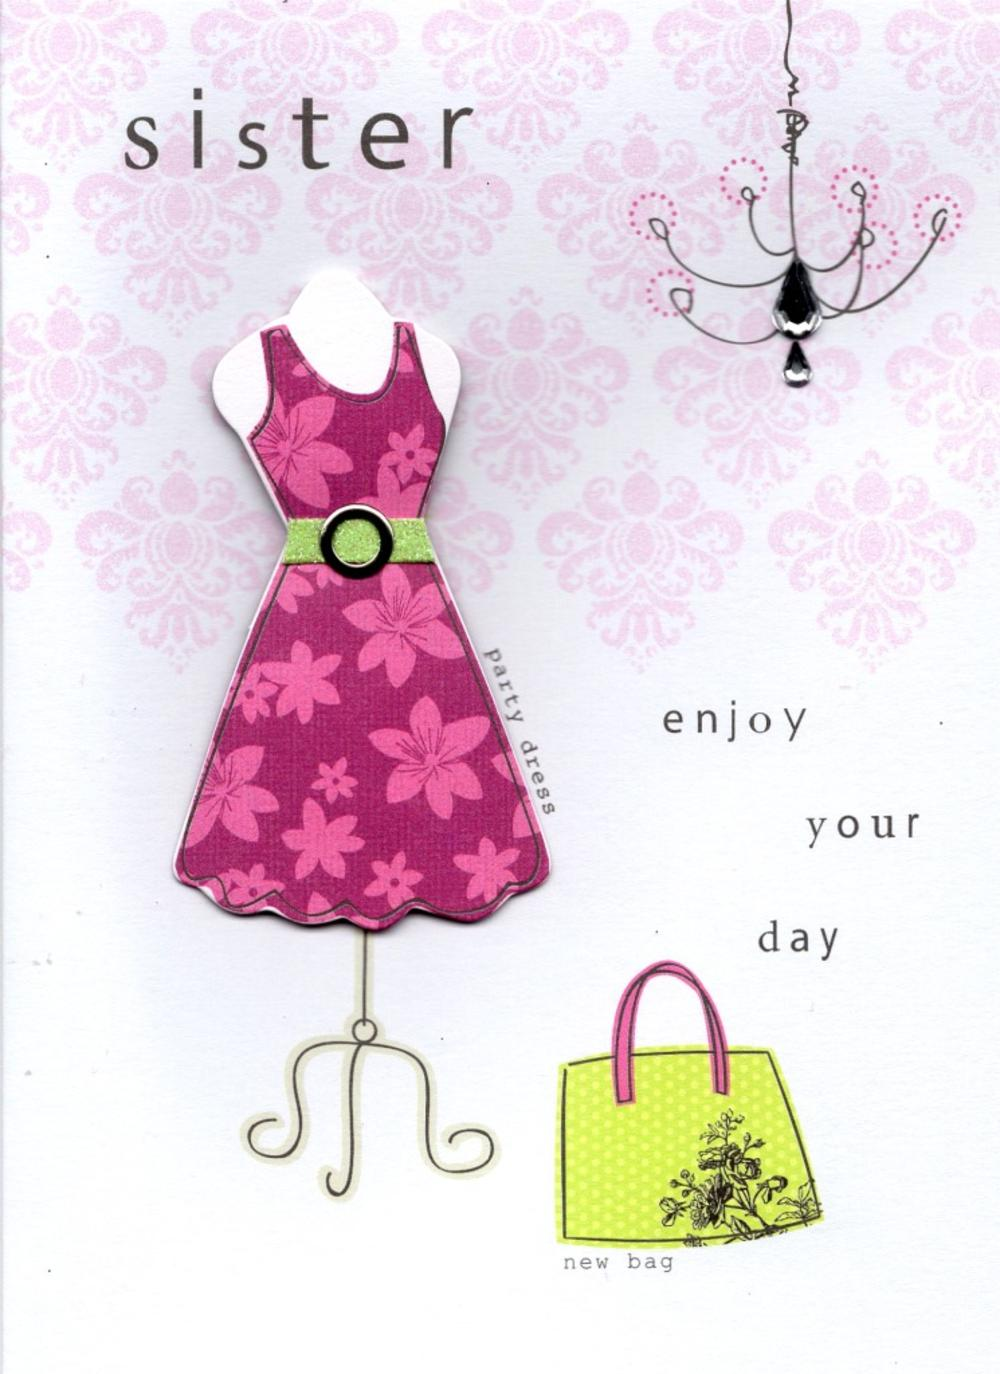 Sister Pretty Dress Handmade Happy Birthday Card | Cards ...